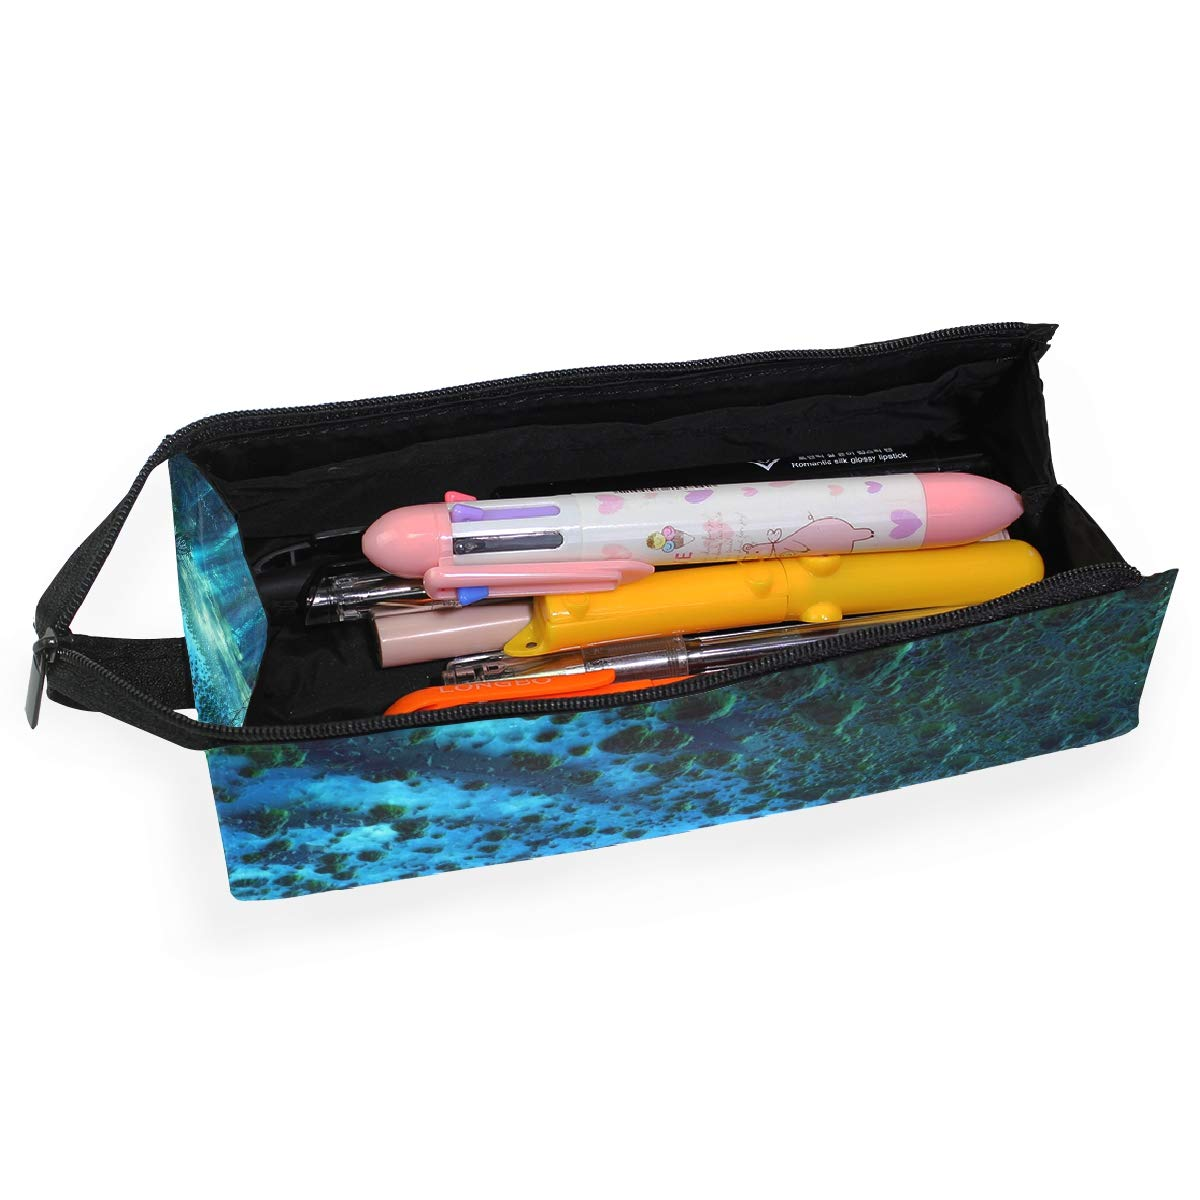 My Little Nest Eyeglass Sunglasses Holder Pouch Bag Colorful Rainbow Fish Multi Function Zipper Pen Case Pencil Bag Organizer